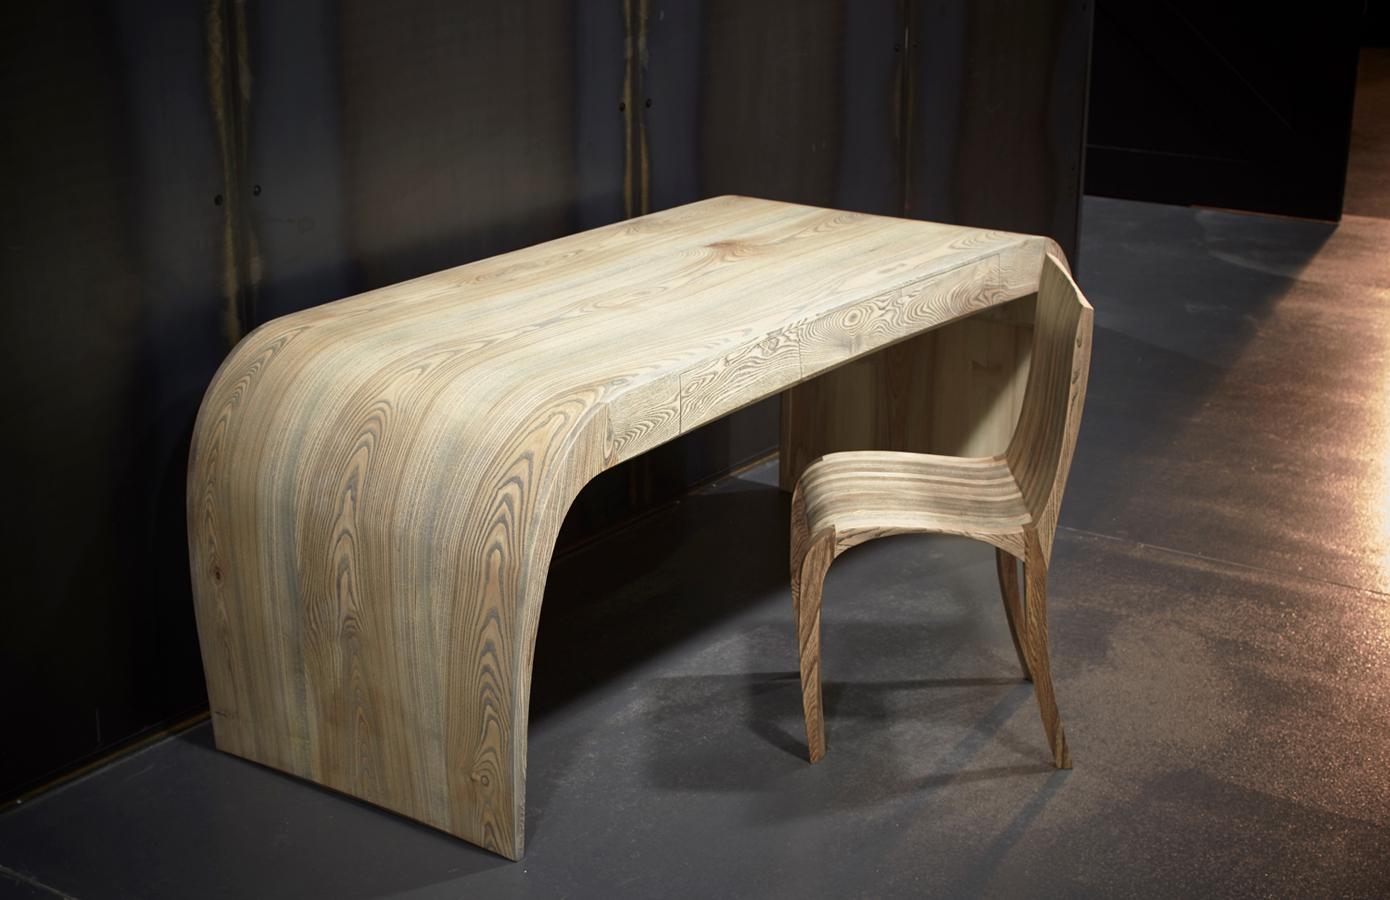 9Ash-ebony-stained-Calliper-desk-with-file-storage-unit_1.jpg